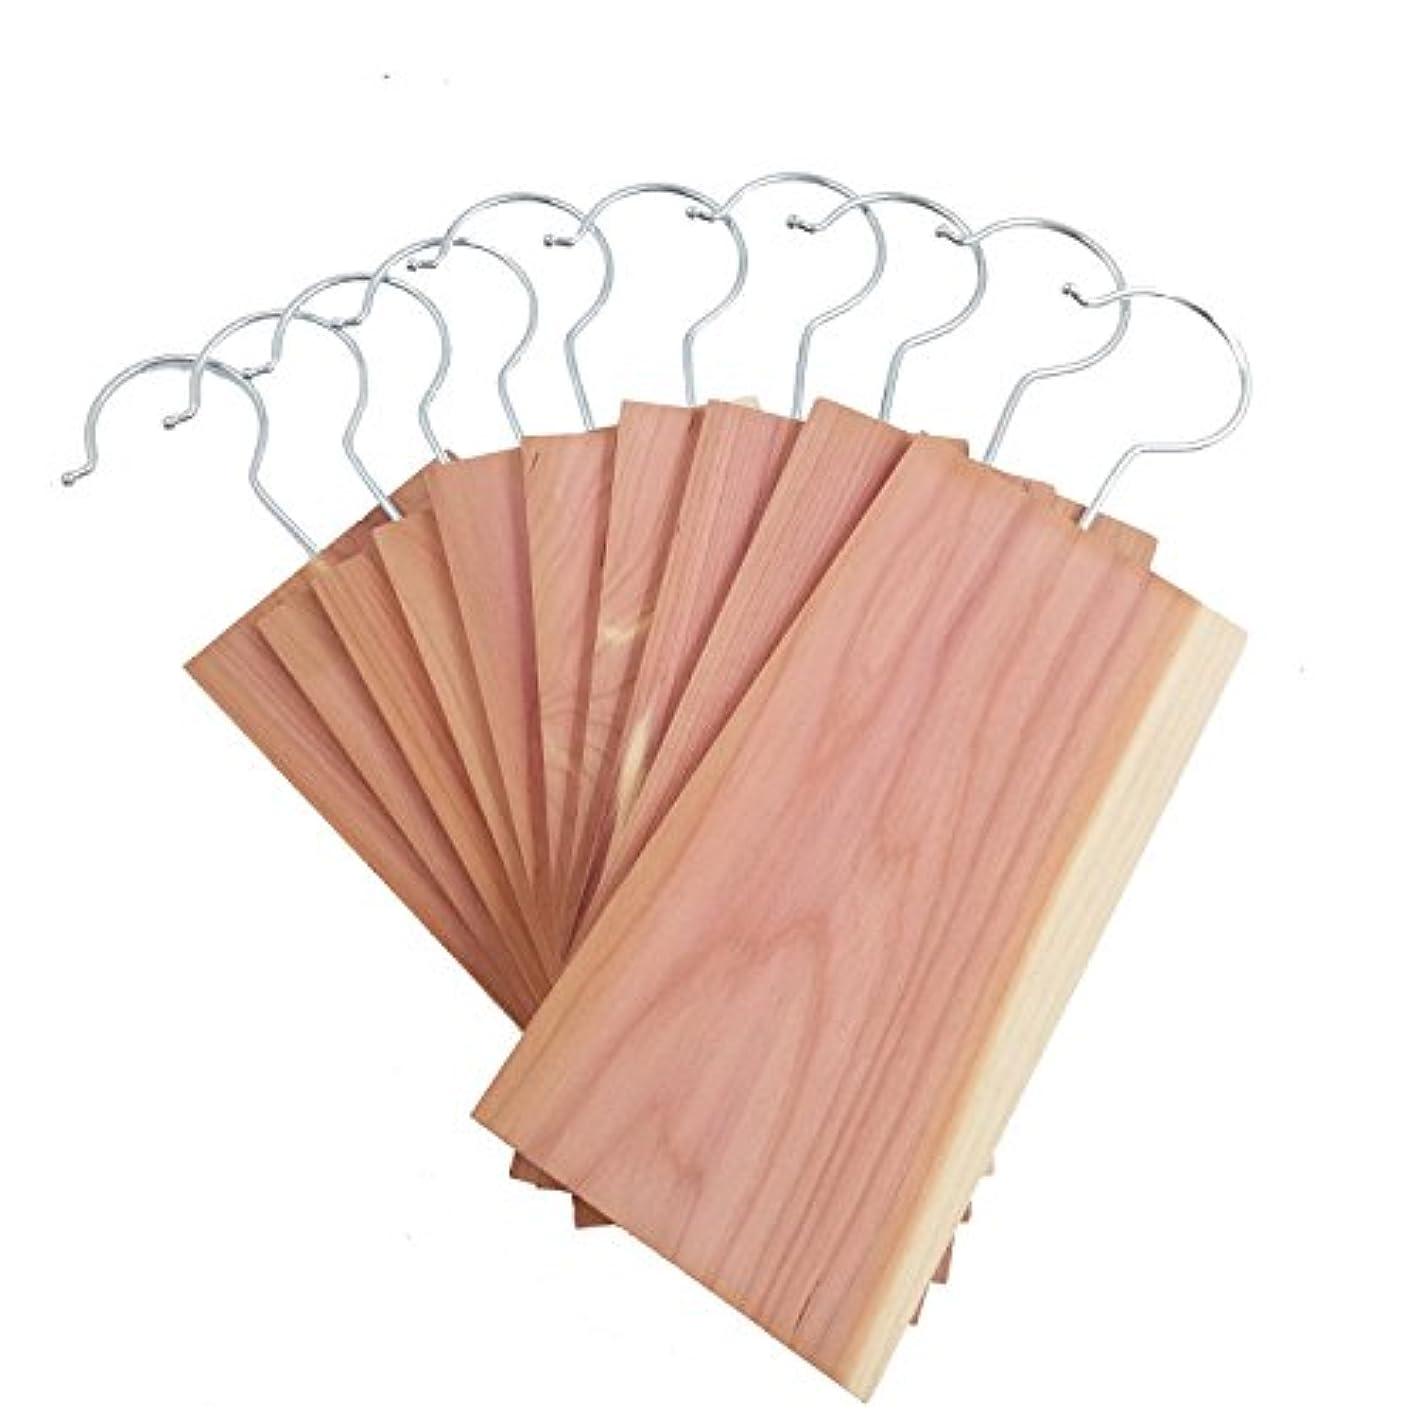 D.Jacware Cedar Moth Protection, Cedar Hang Up Set for Closets Cloth Protector (10 Pack)